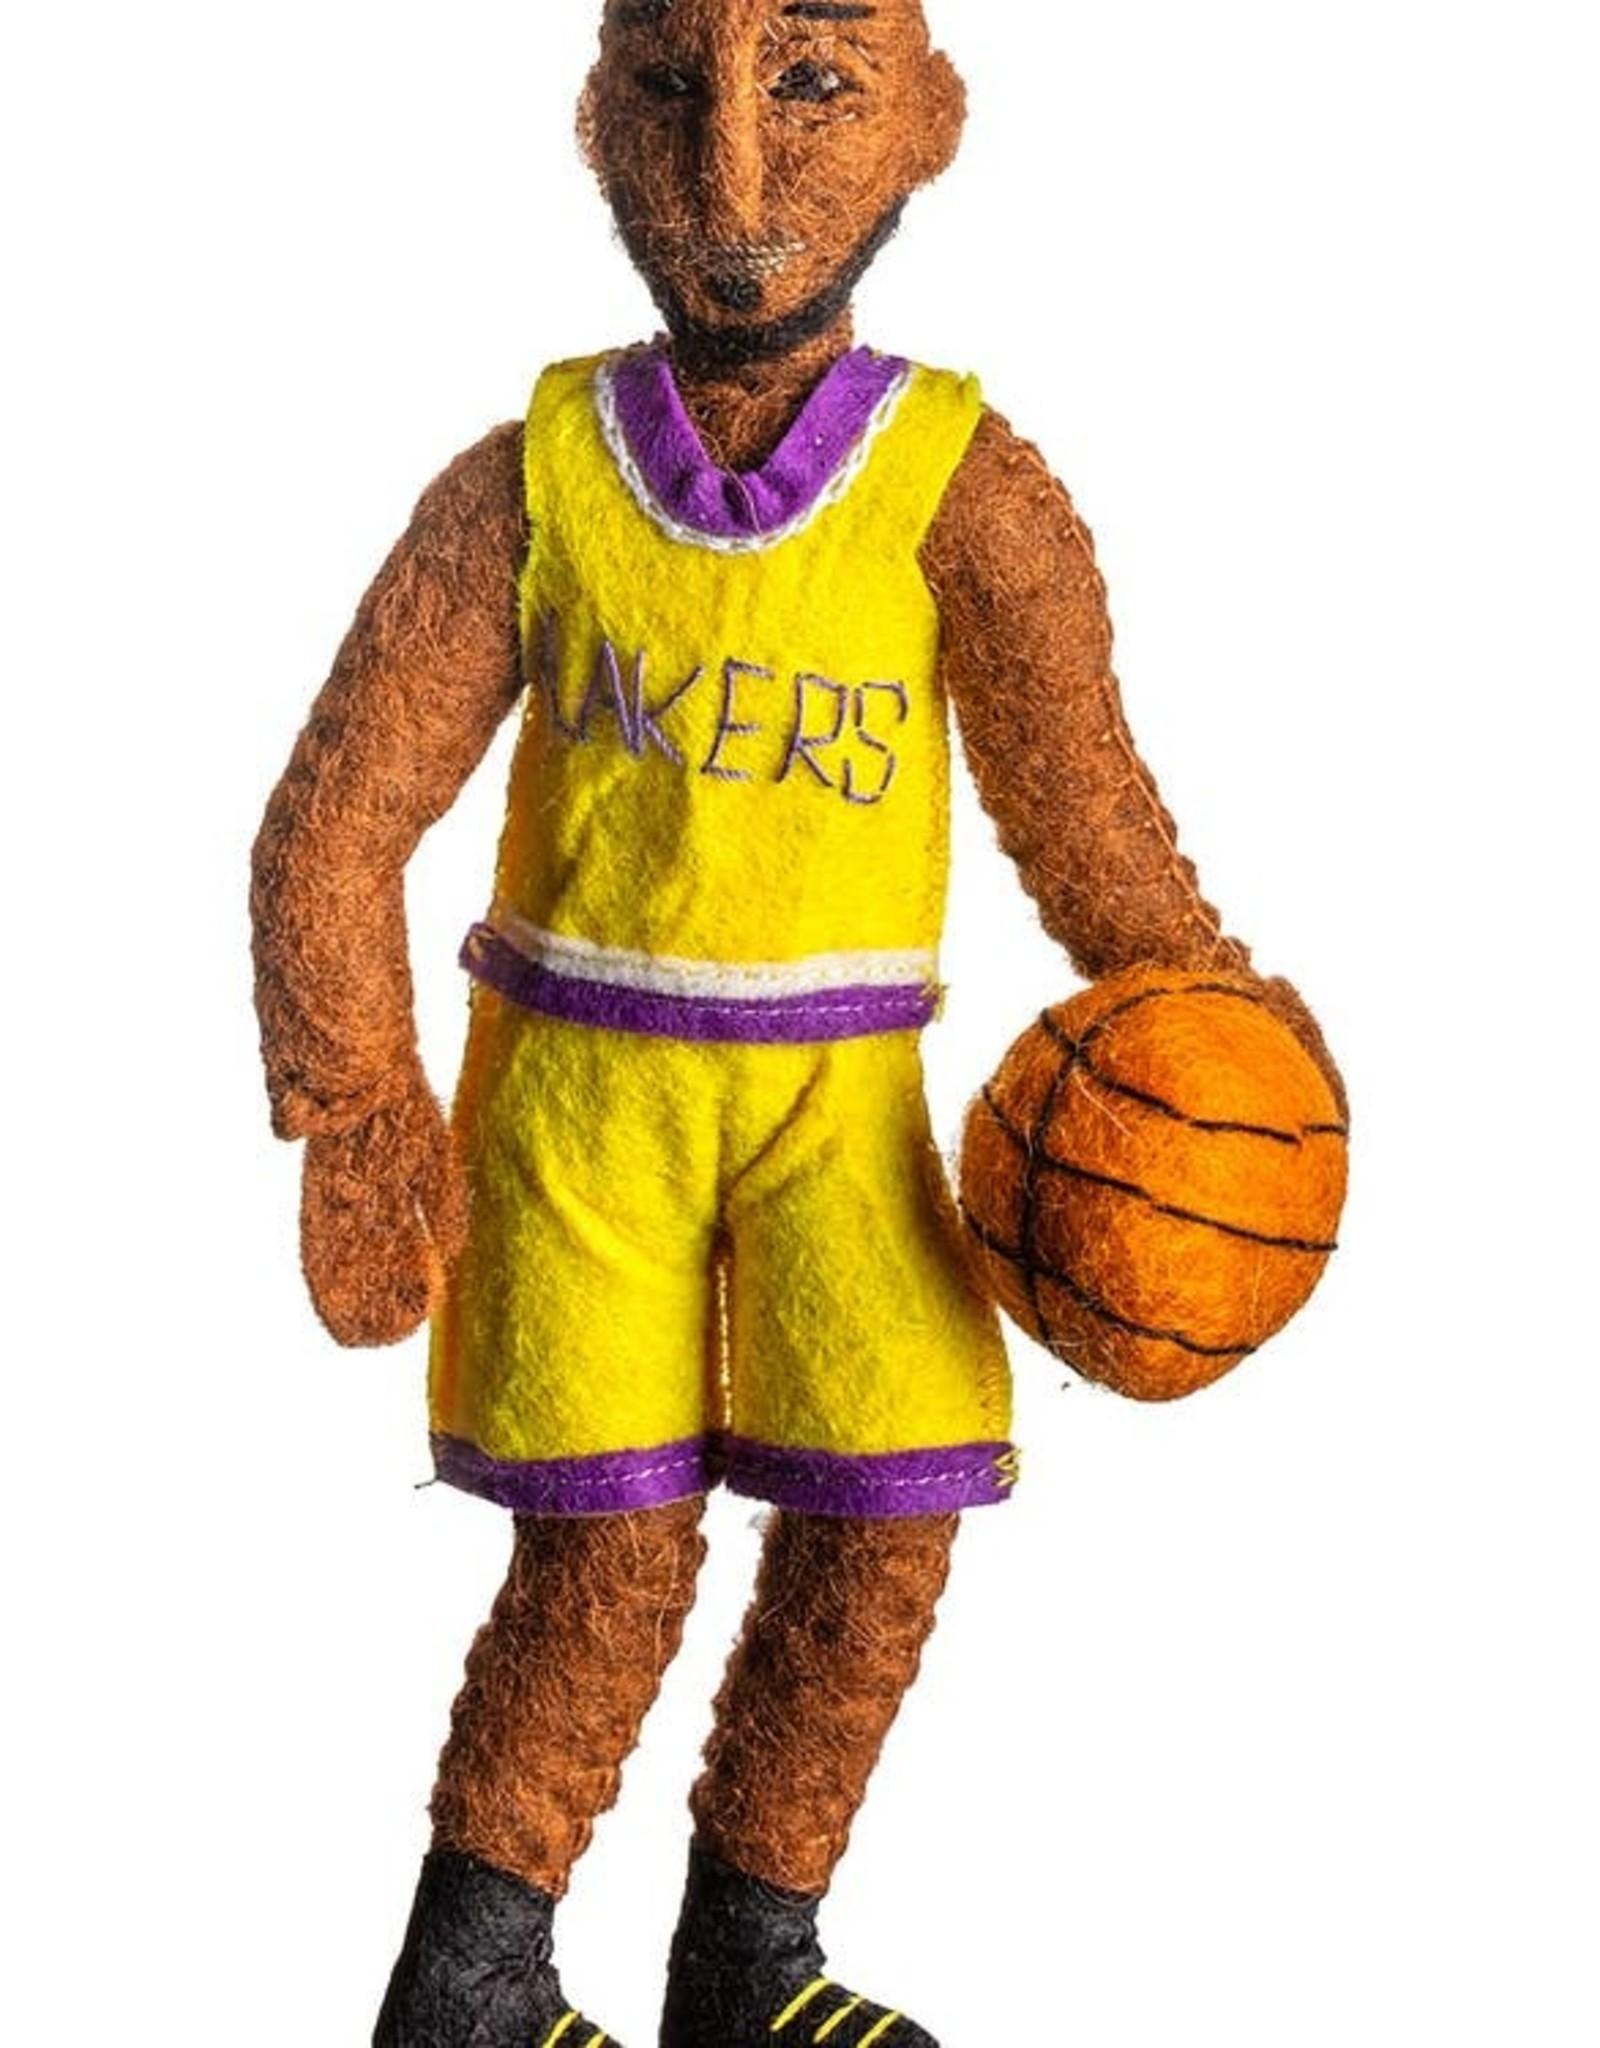 Kobe Bryant Ornament